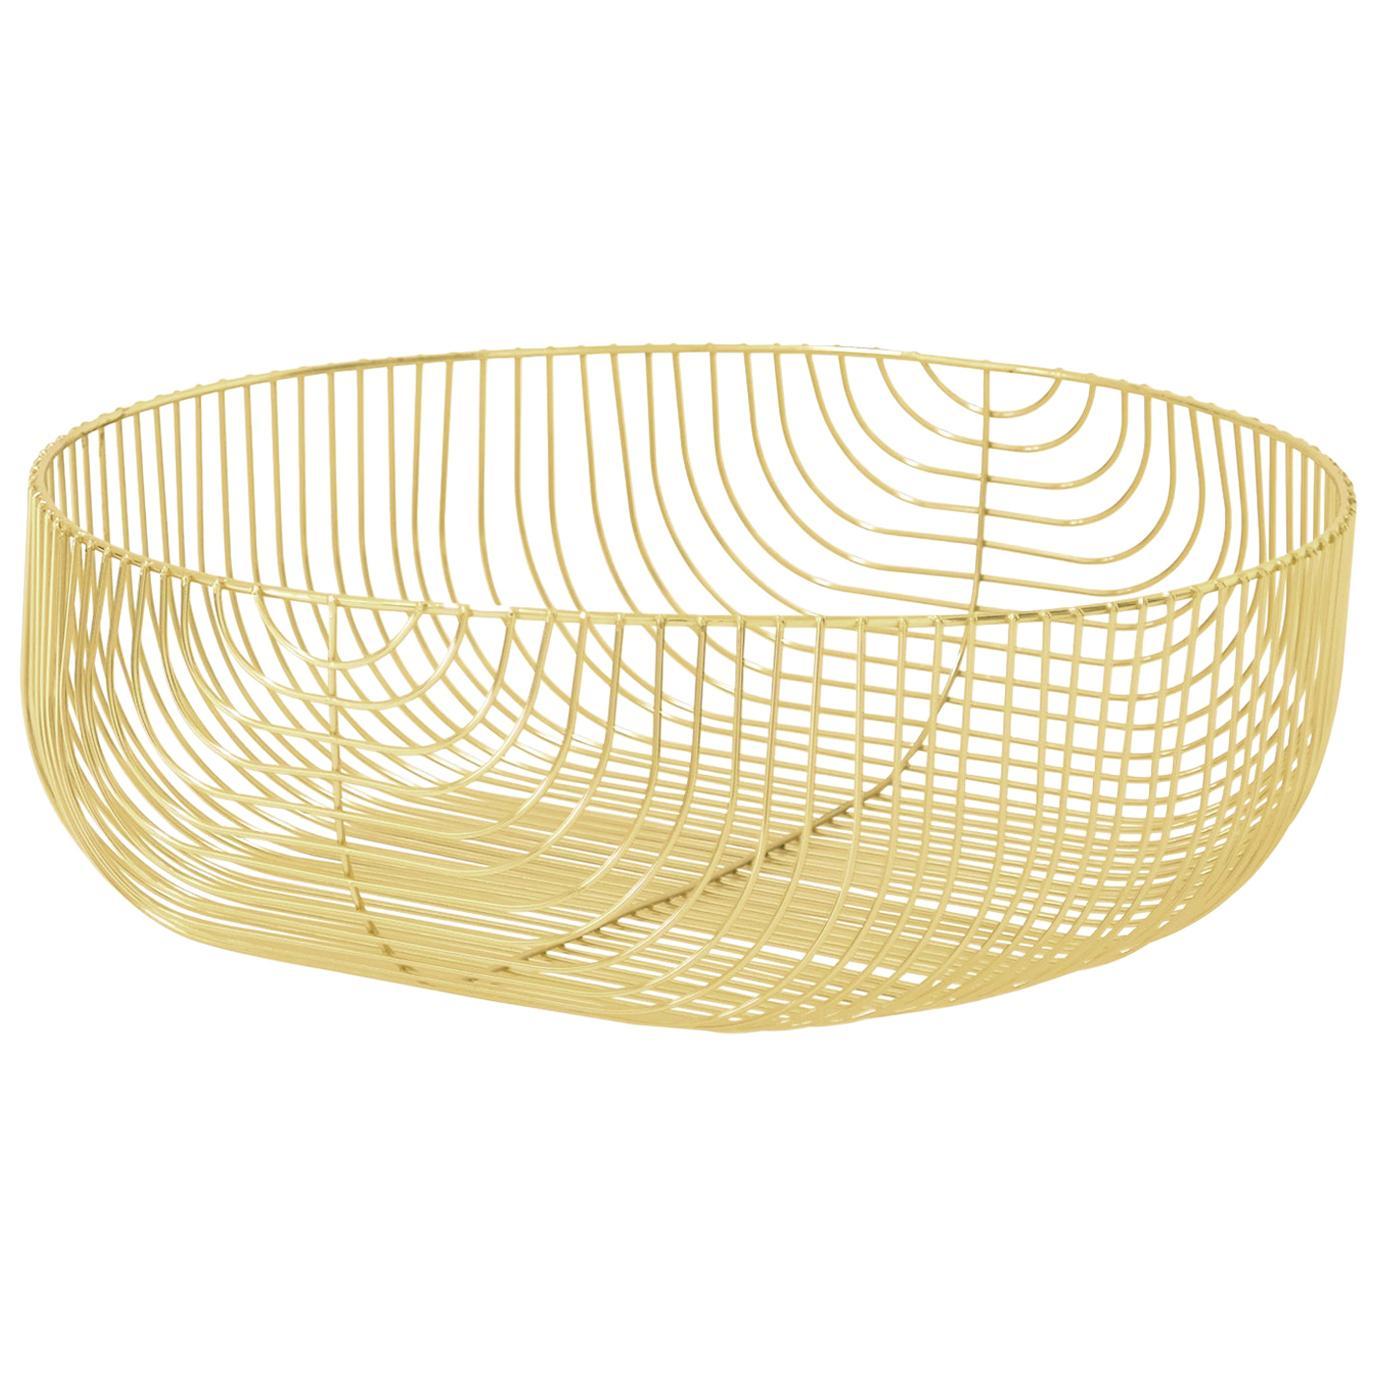 Large Sized Basket, Basket, Wire Design by Bend Goods, Gold